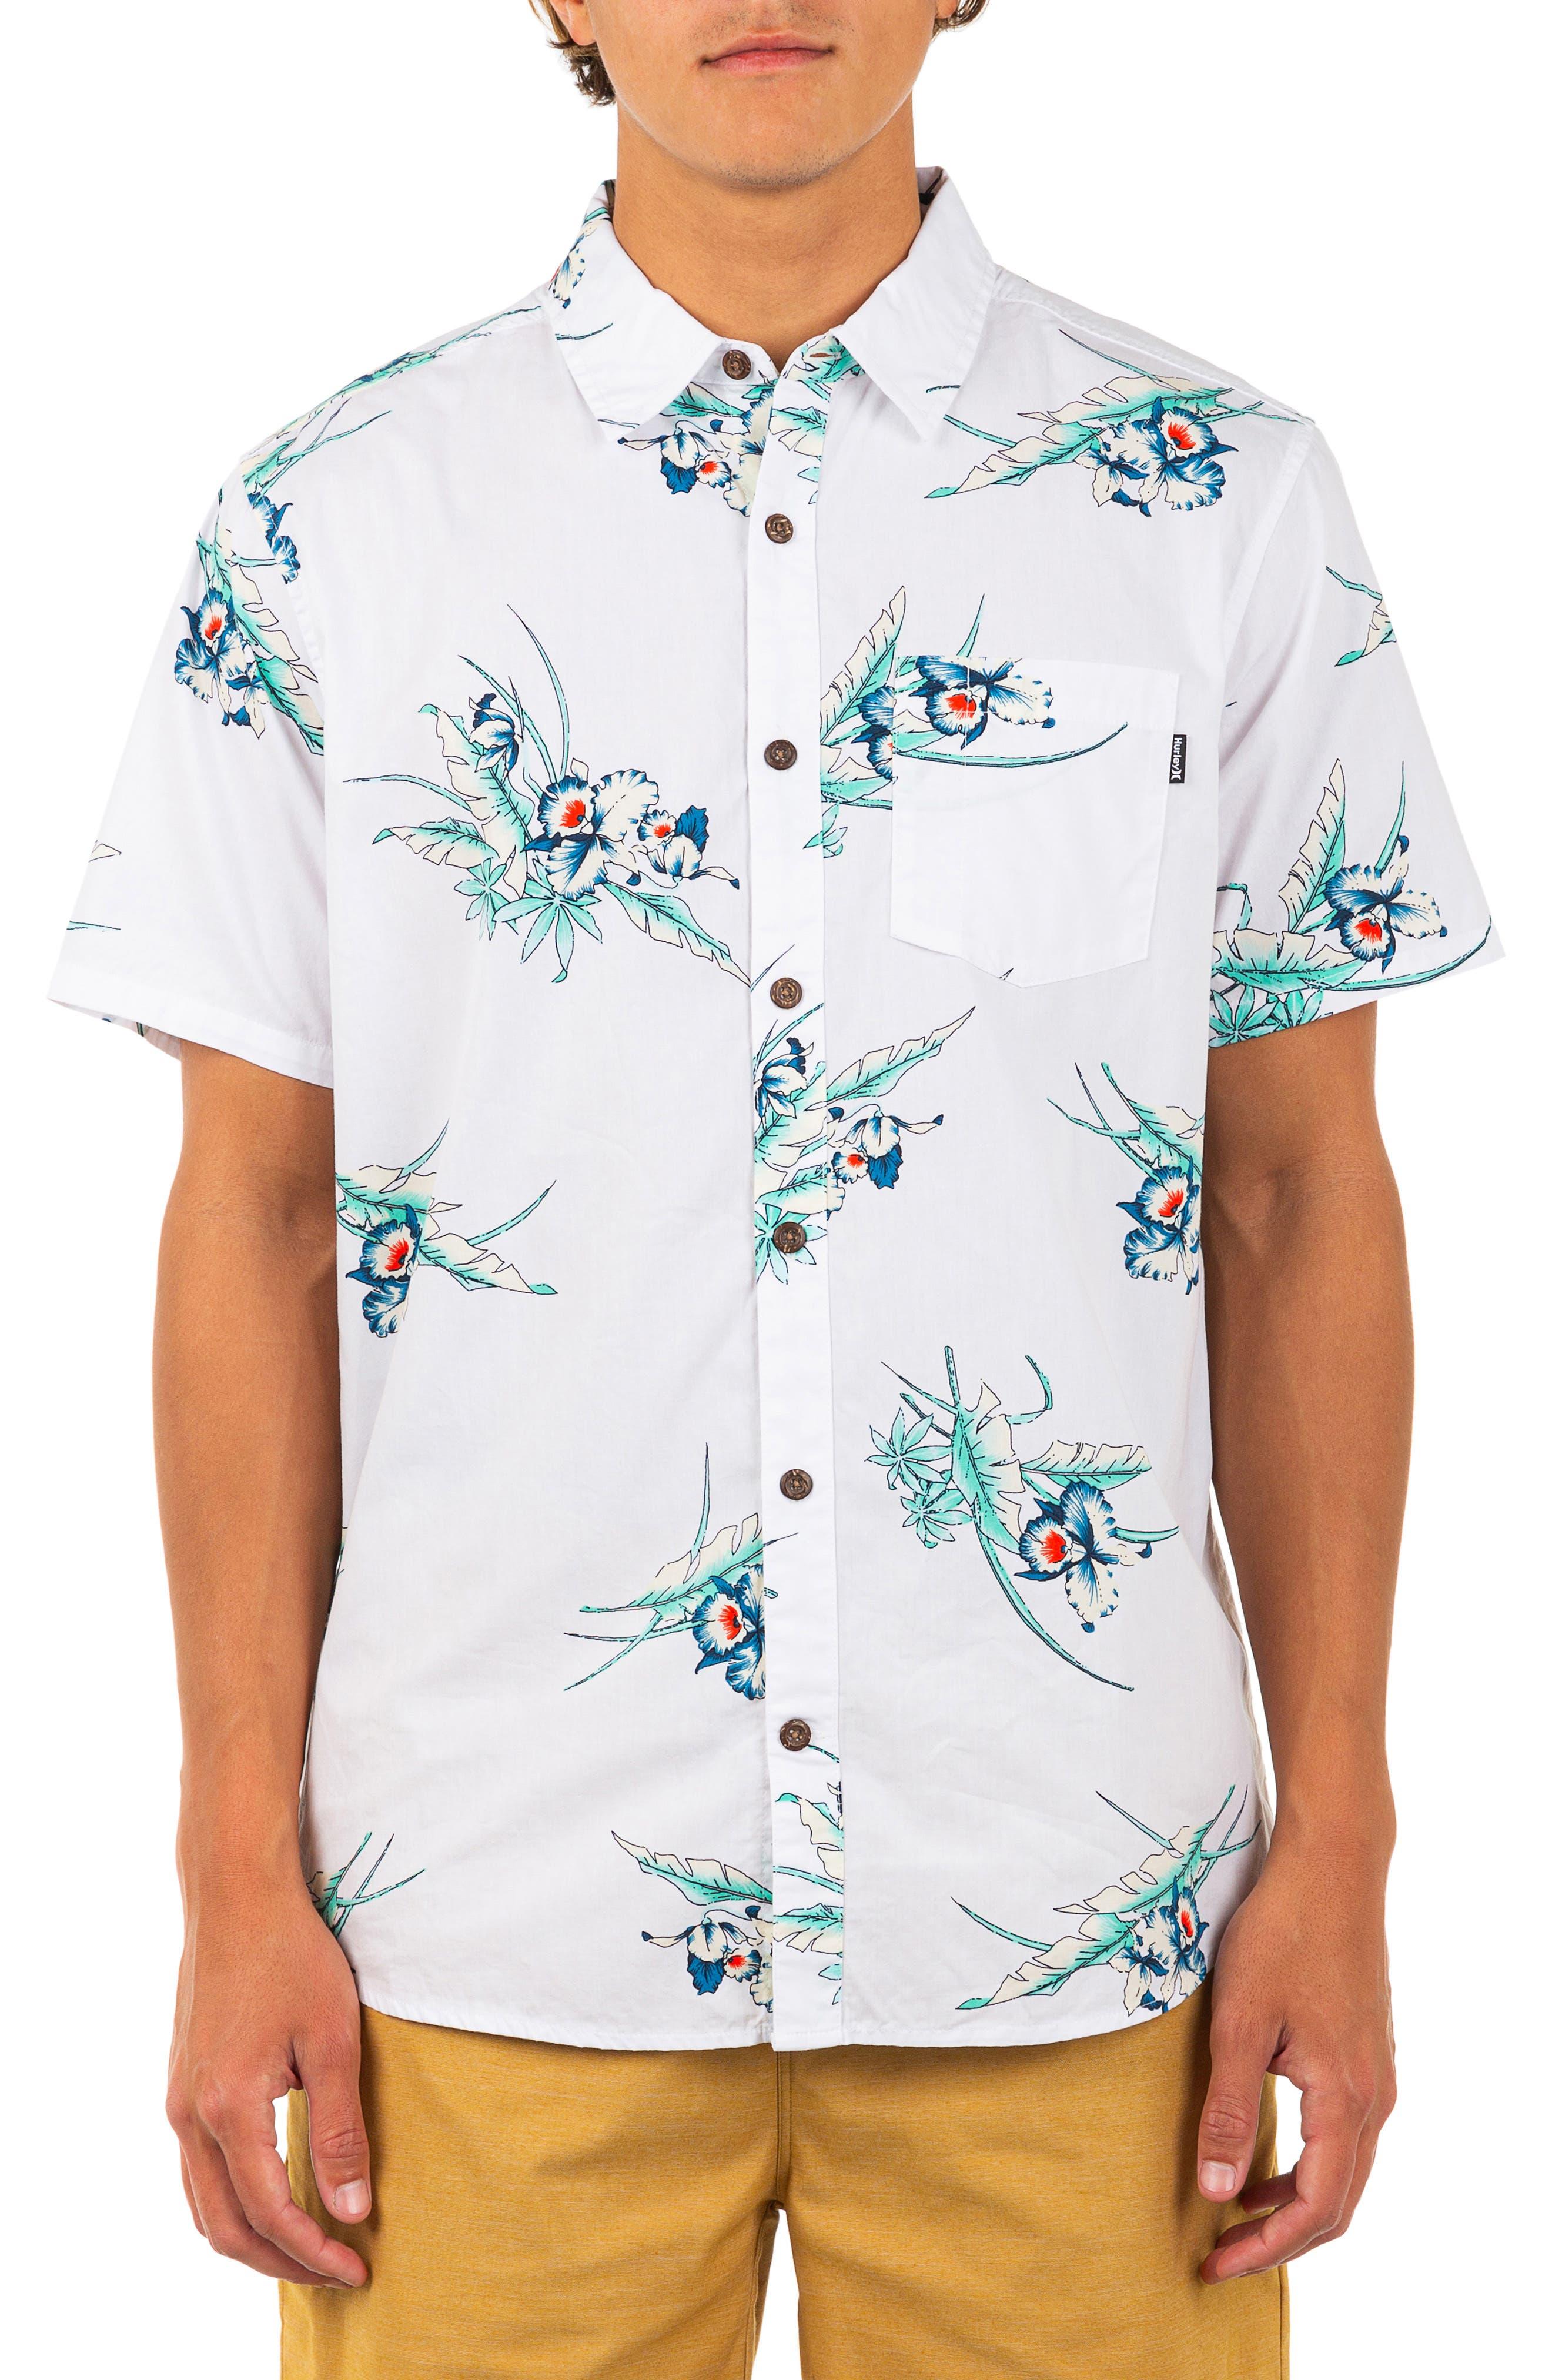 Del Mar Regular Fit Tropical Print Organic Cotton Short Sleeve Button-Up Shirt